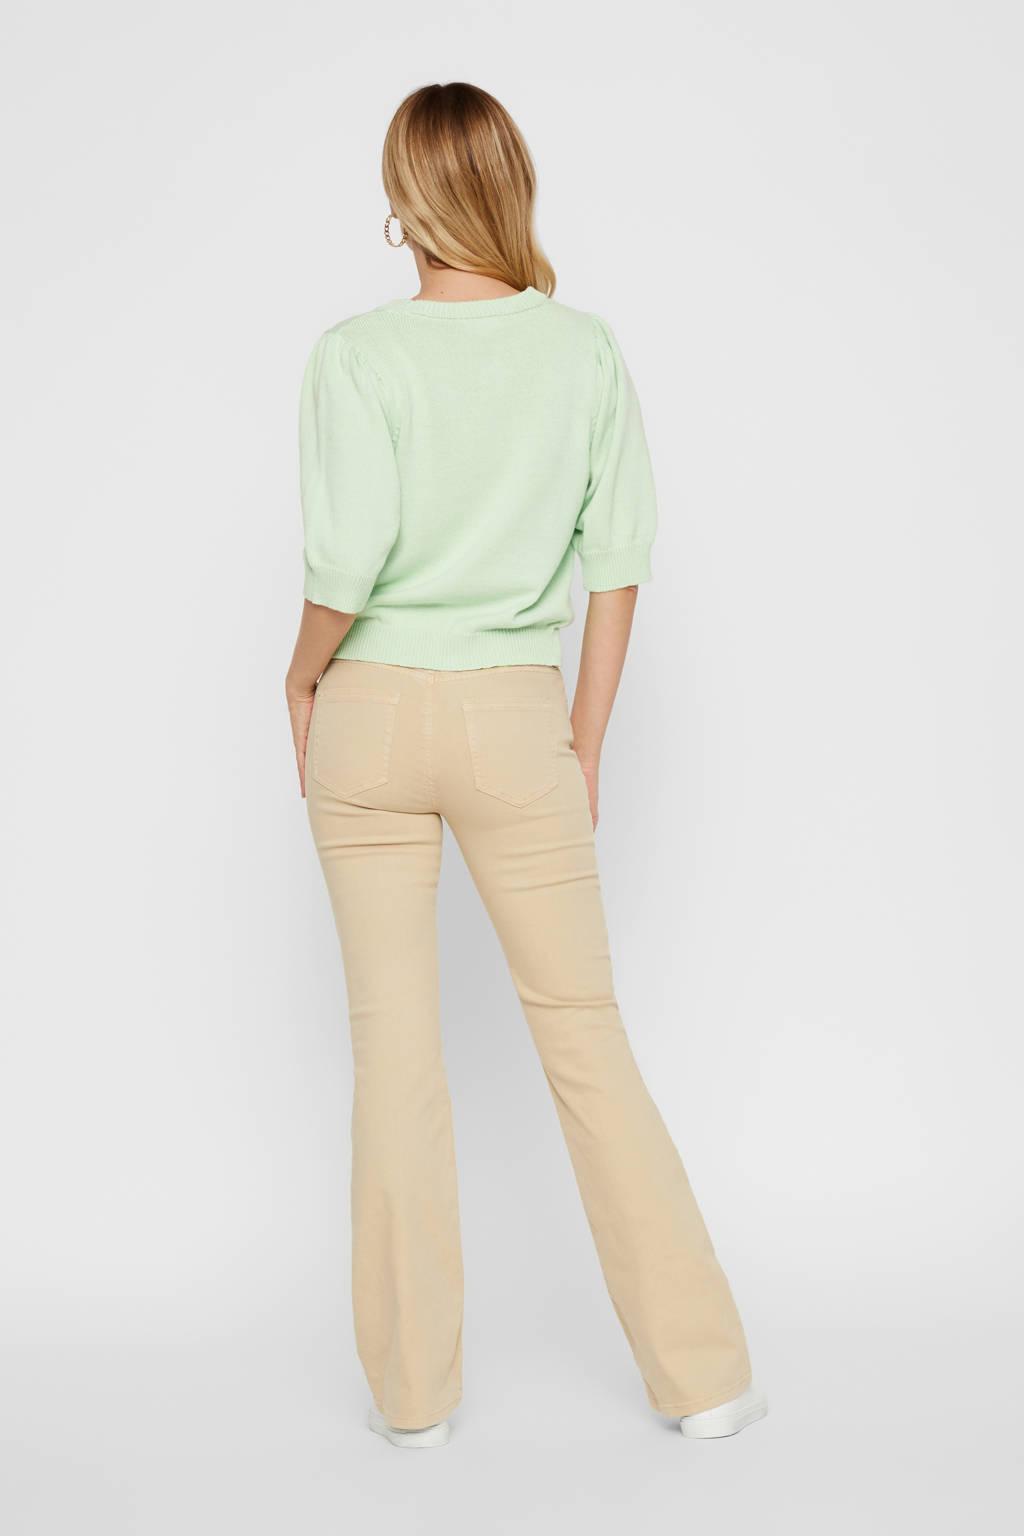 PIECES flared jeans grijs, Beige